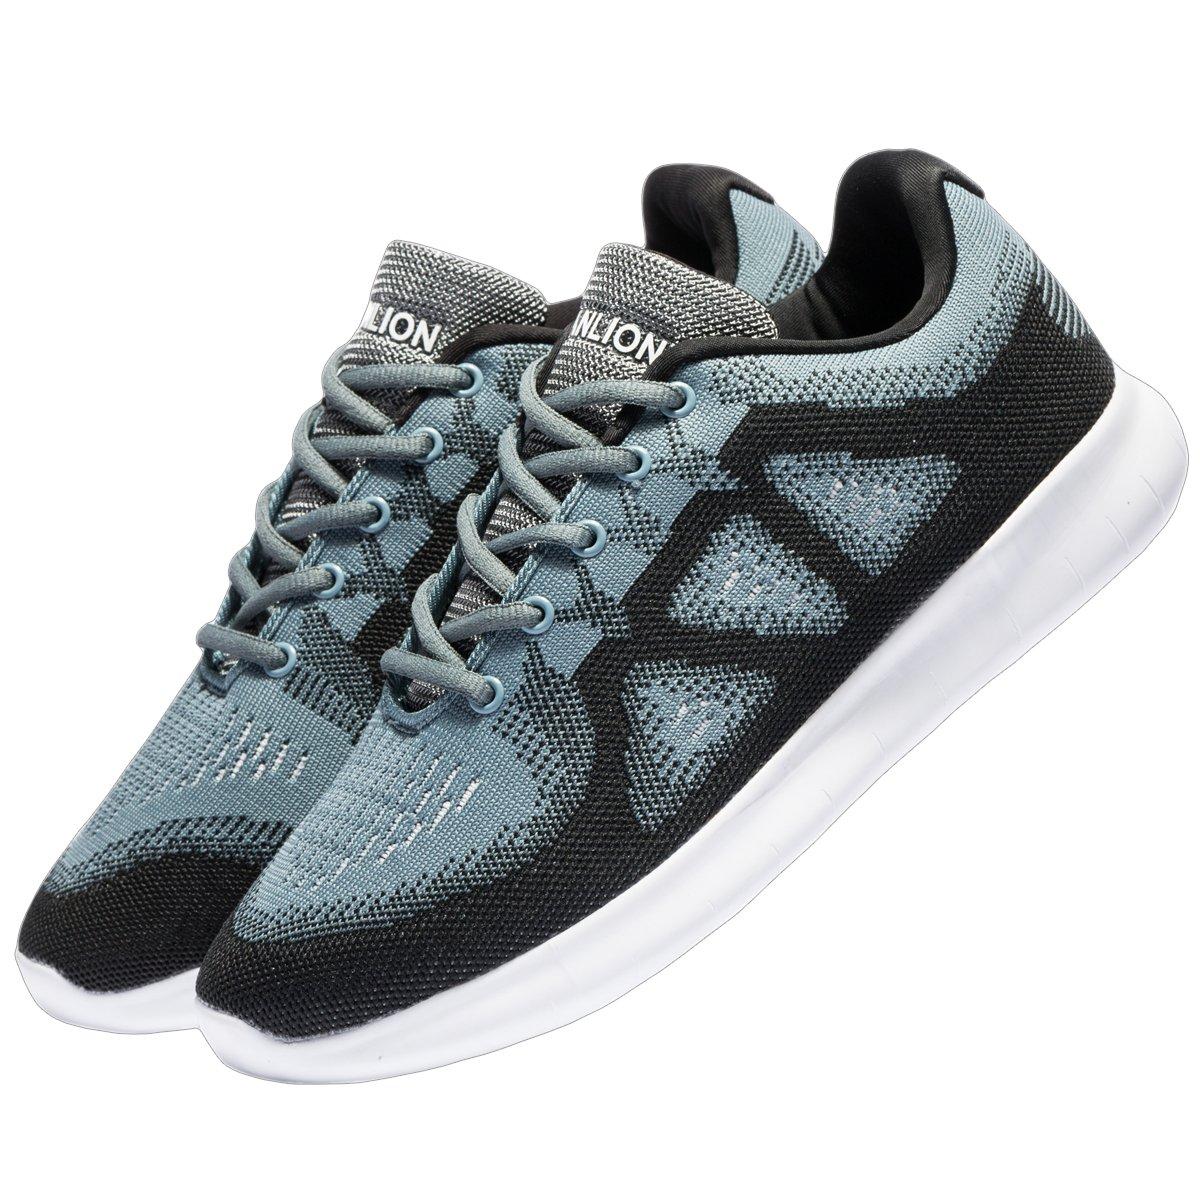 sanlion Men Knit Lightweight Cross Training Running Shoes Breathable Athletic Shoes (10 D(M) US / 44 M EU, Black/Gray/White)